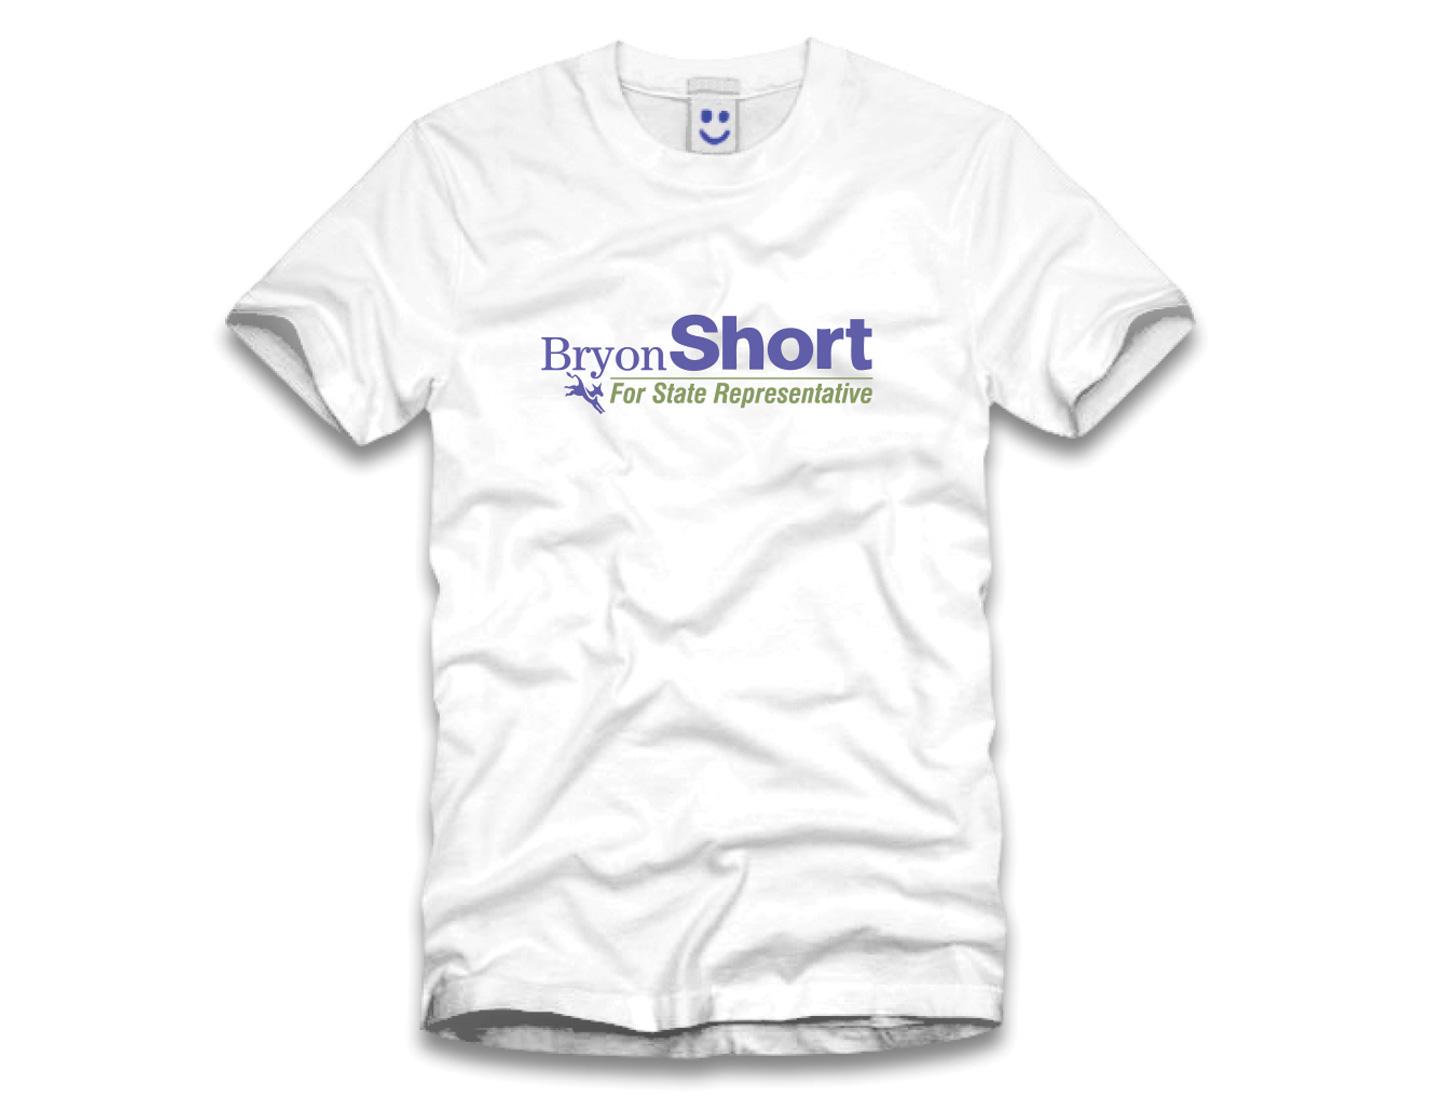 Bryon-Short-Screen-Print-Tee.jpg